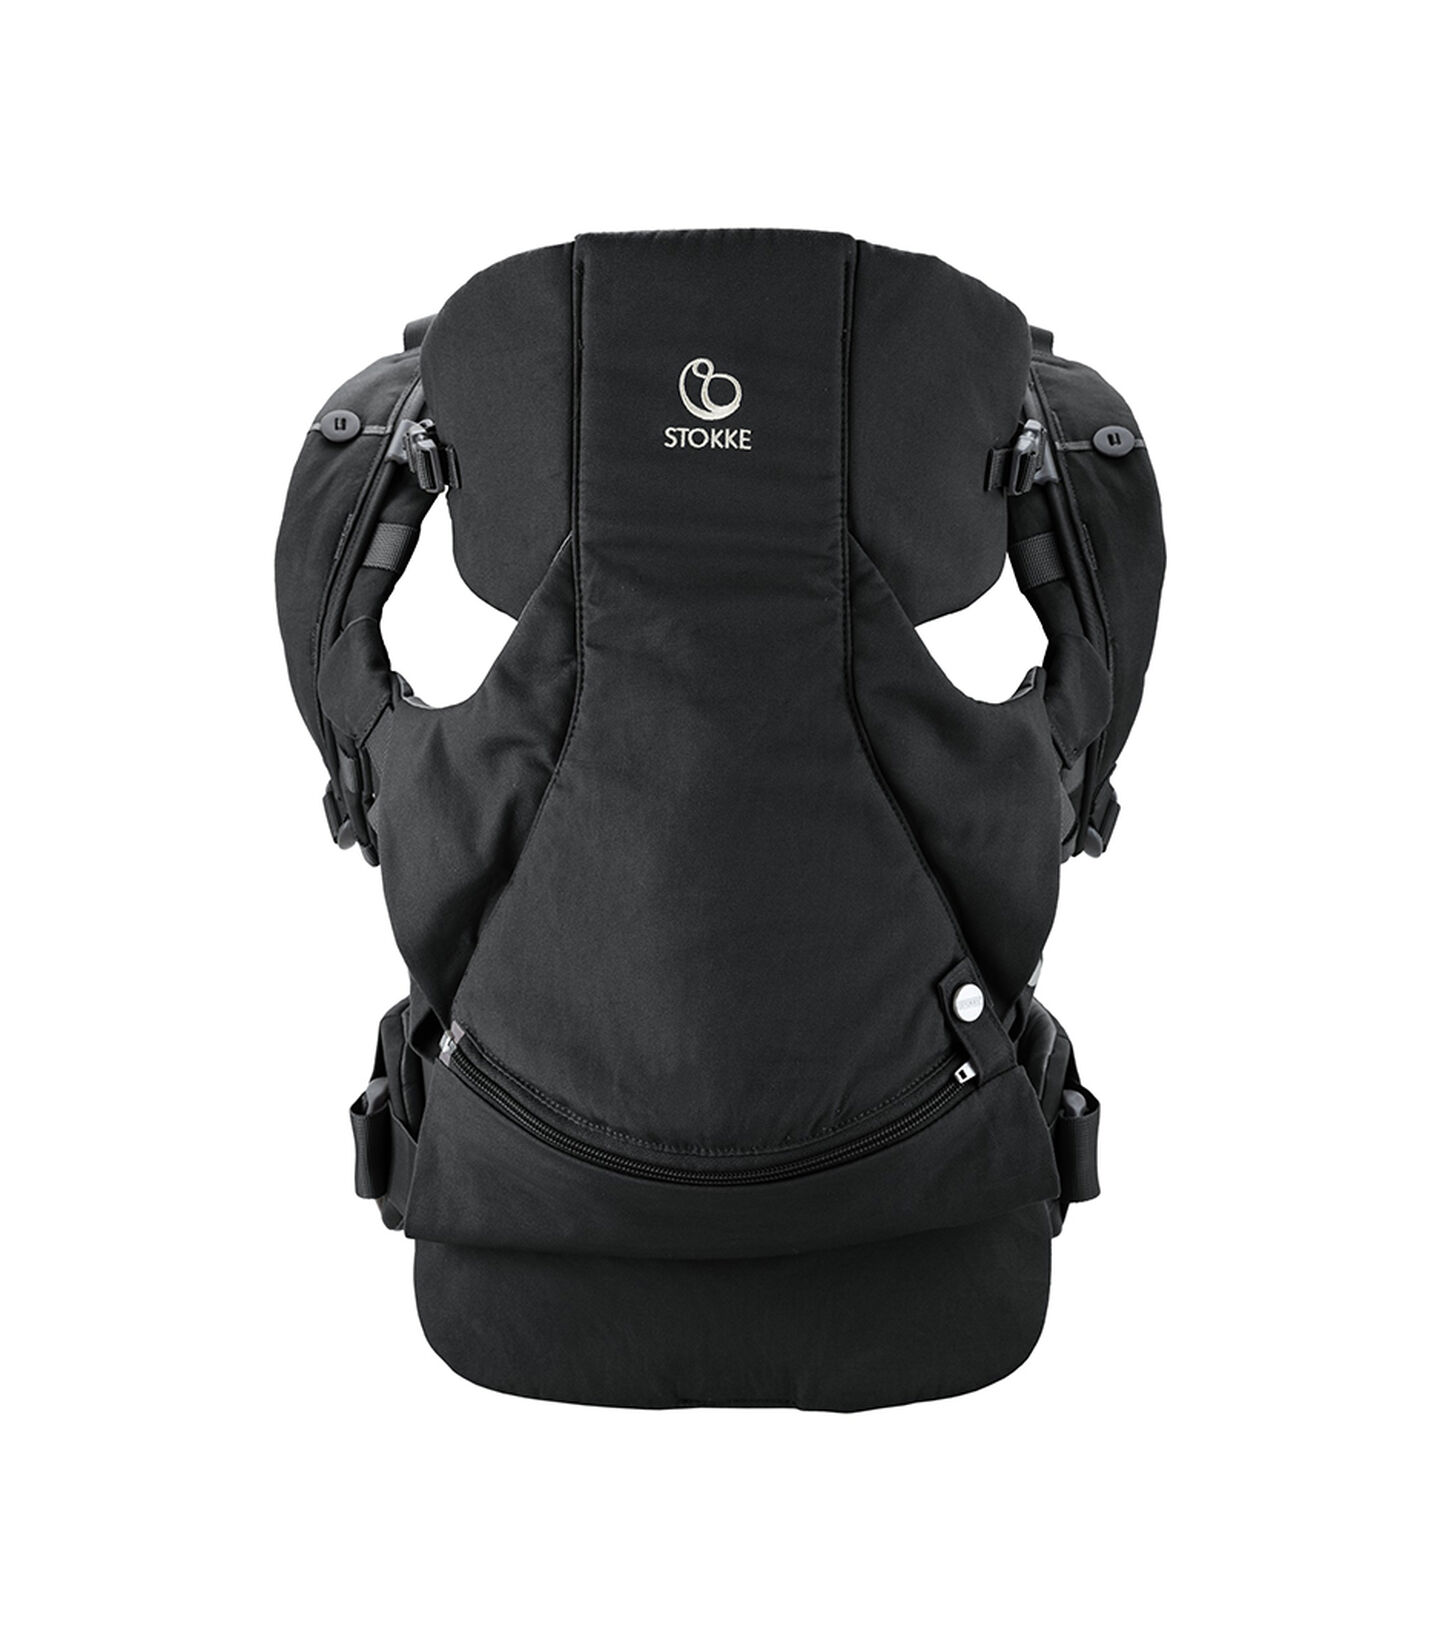 Stokke® MyCarrier™ mag- och ryggsele Black, Black, mainview view 2